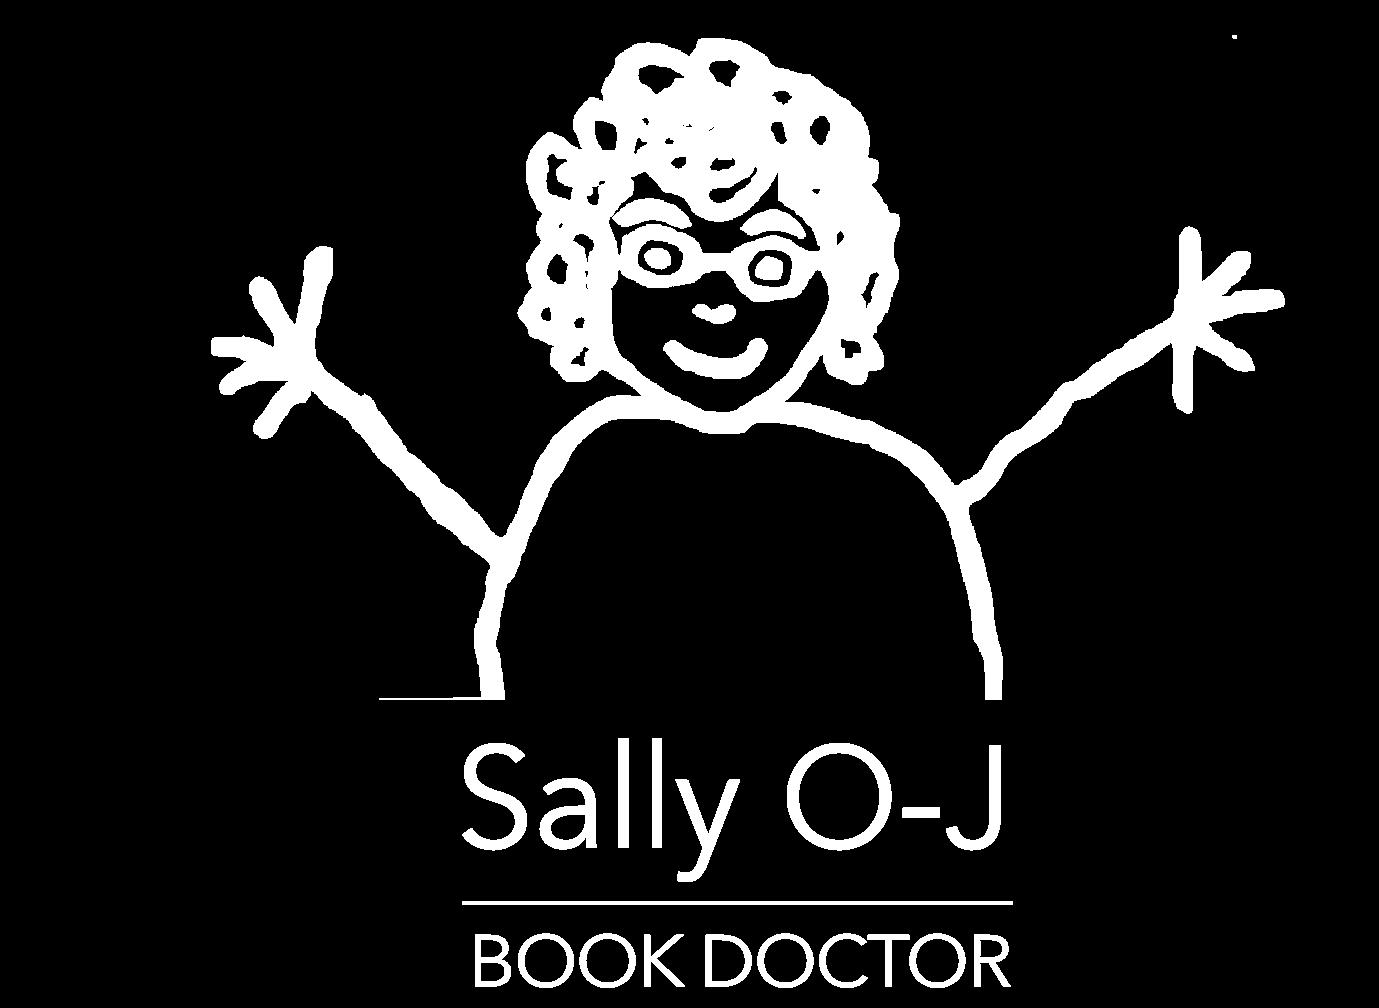 Sally OJ